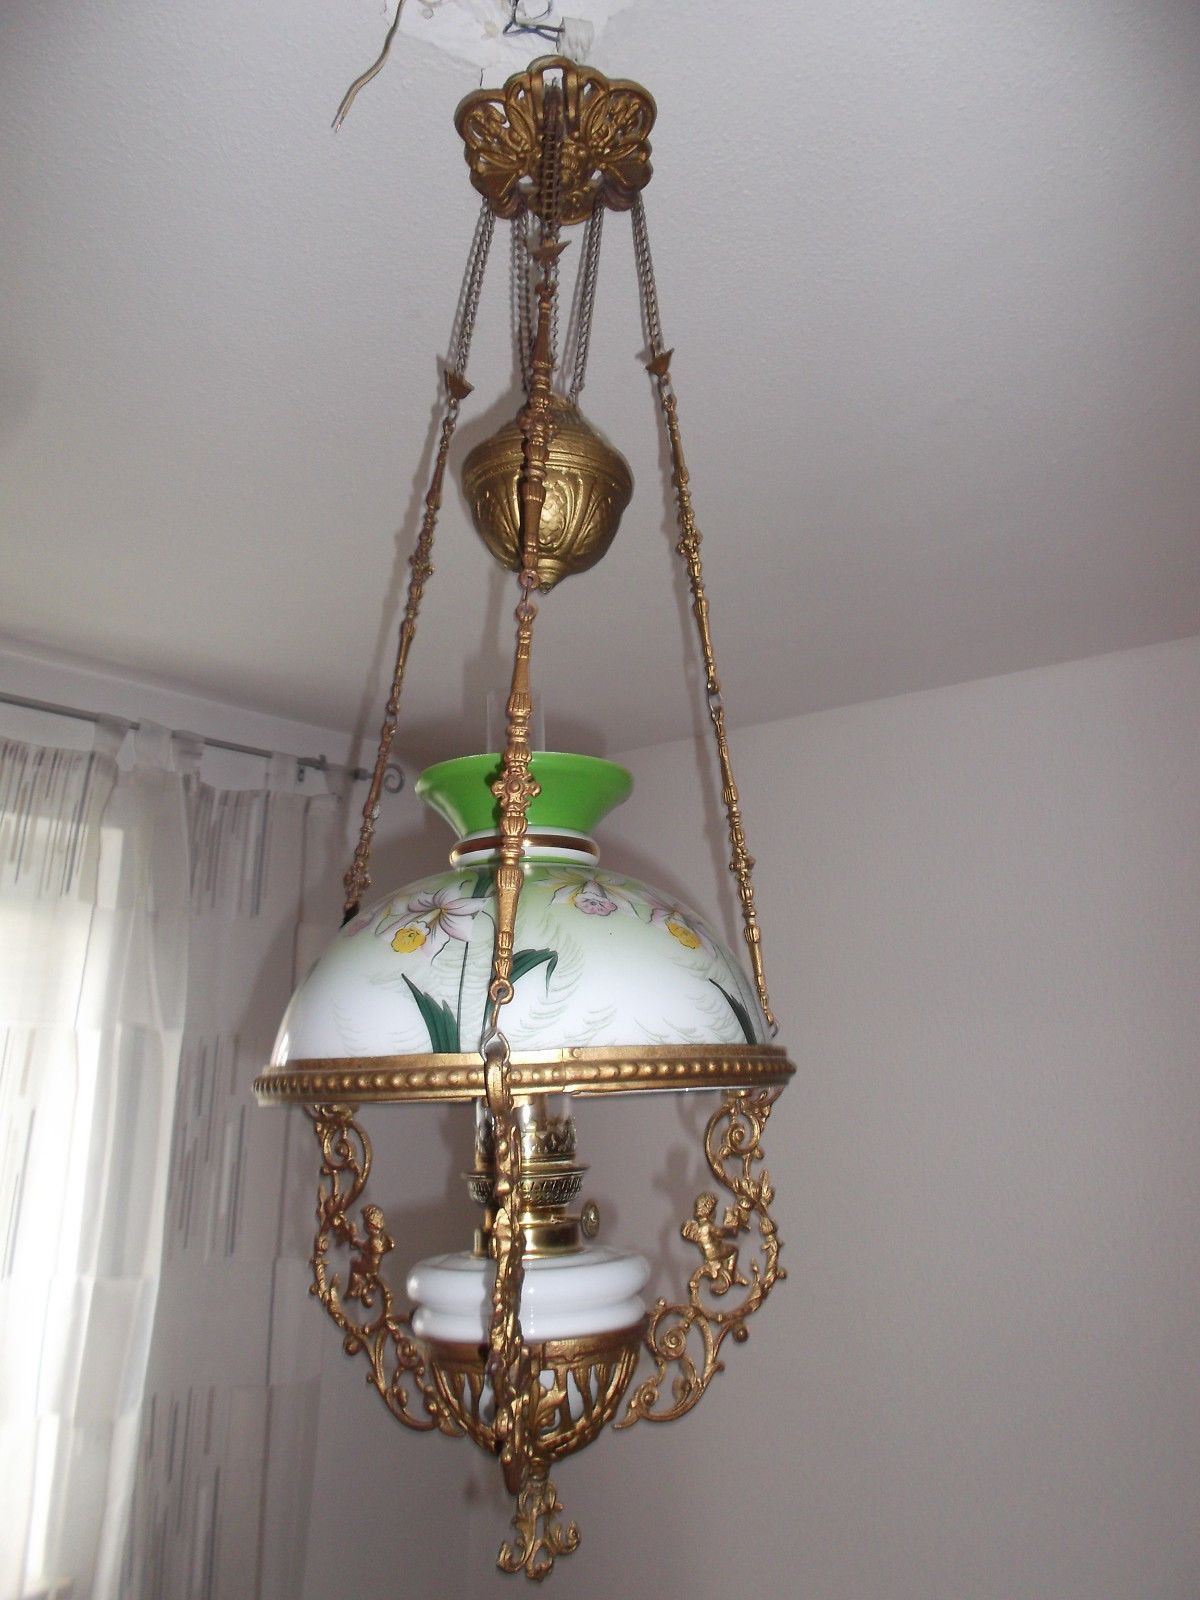 Hanging oil petroleum kerosene lamp shade gaudard a p morbier hanging oil petroleum kerosene lamp shade gaudard a p morbier ebay mozeypictures Gallery